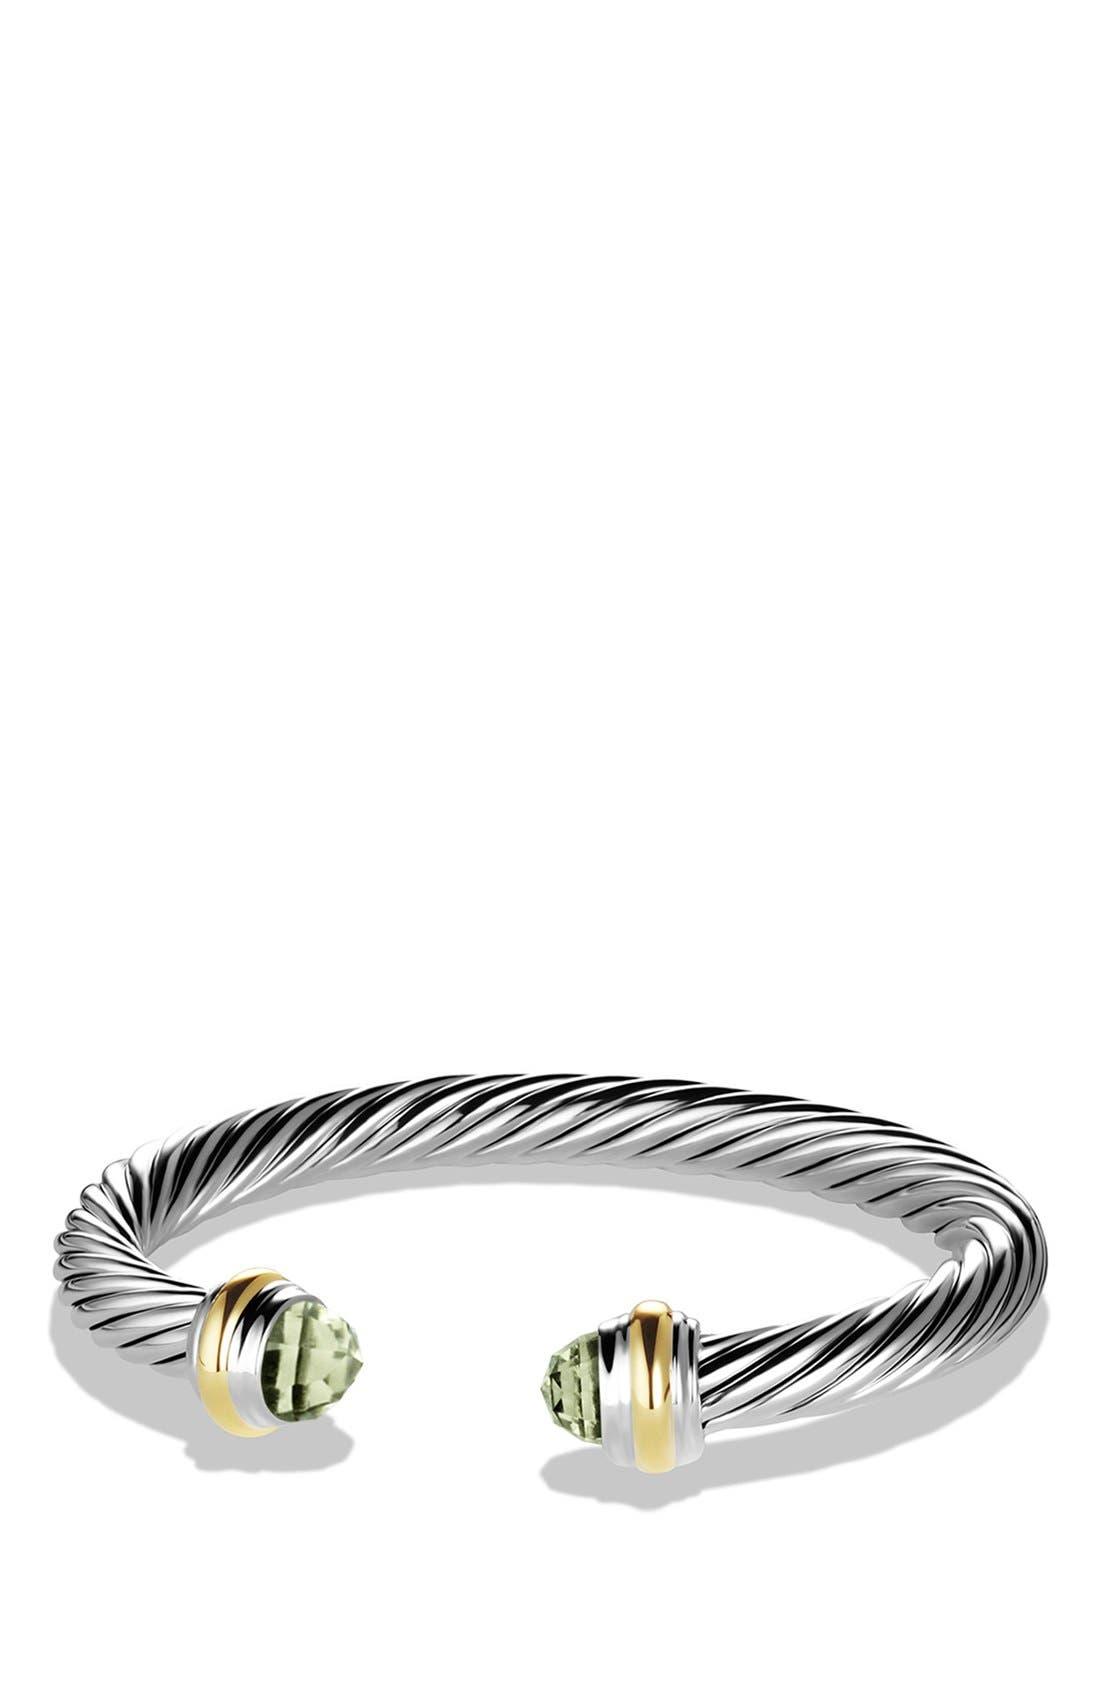 DAVID YURMAN, Cable Classics Bracelet with Semiprecious Stones & 14K Gold, 7mm, Main thumbnail 1, color, PRASIOLITE